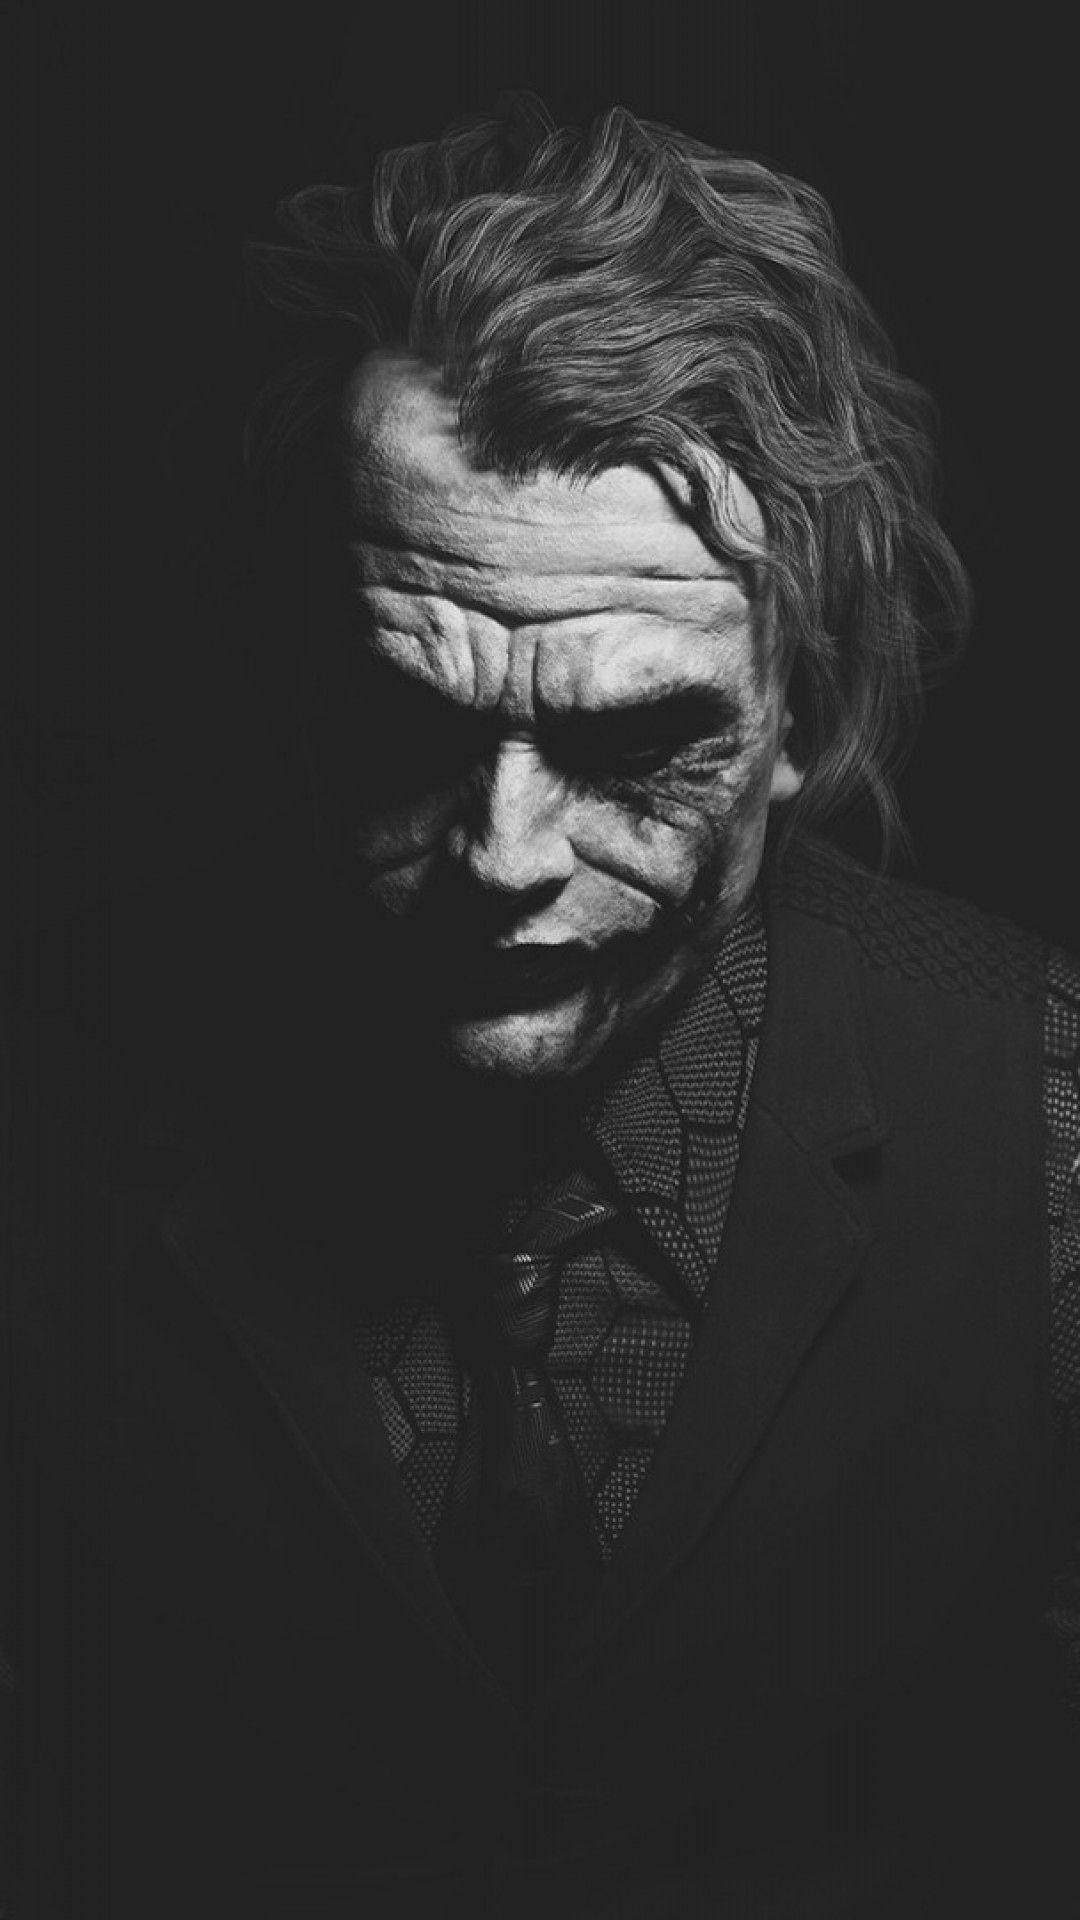 Download 1080X1920 Heath Ledger, Joker, Monochrome, Batman